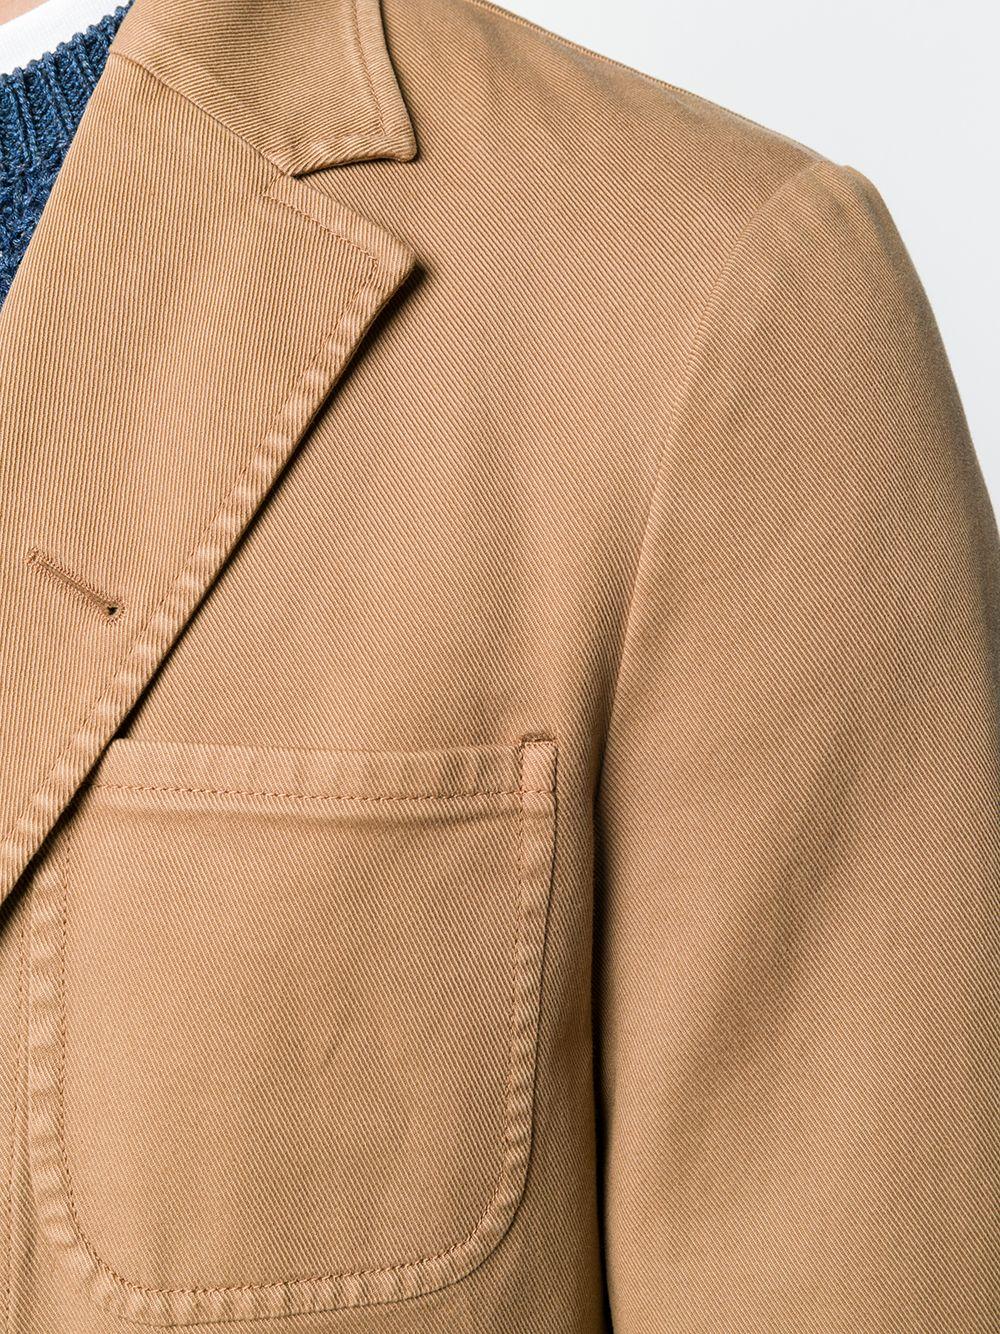 Brown cotton stretch classic fitted blazer BOGLIOLI |  | 0G050Q-BNC405312